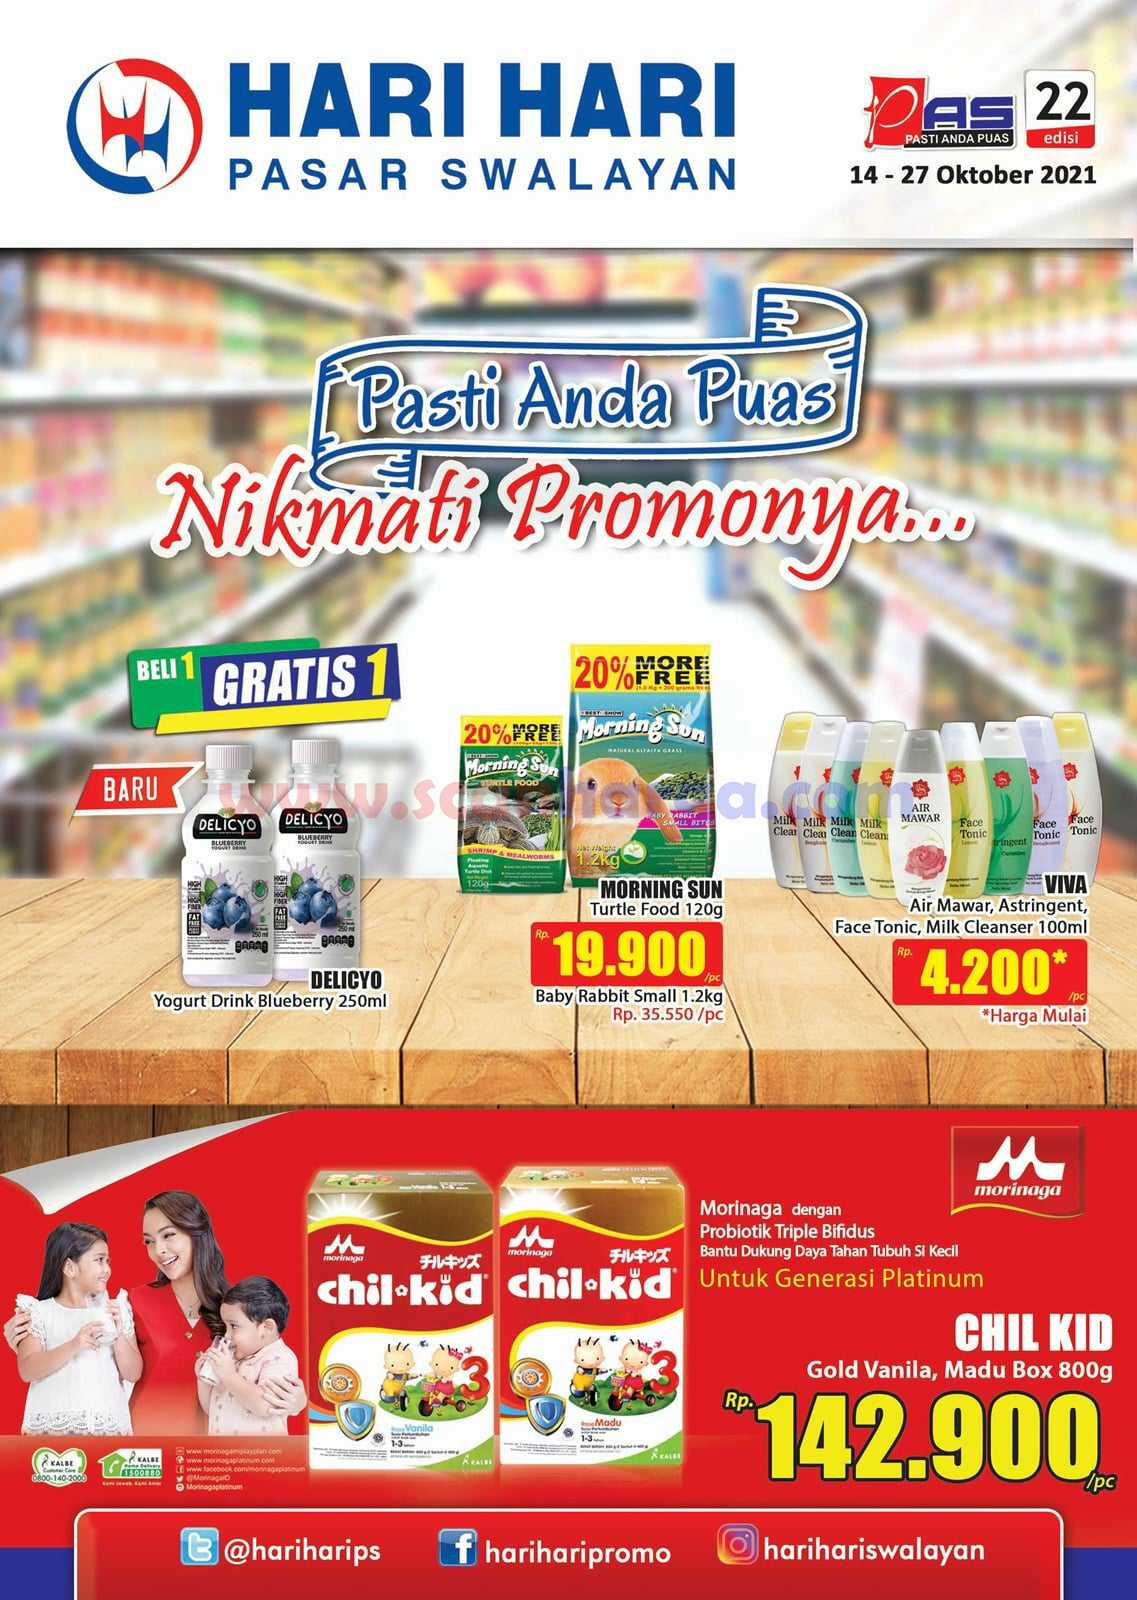 Katalog Promo Hari Hari Pasar Swalayan 14 - 27 Oktober 2021